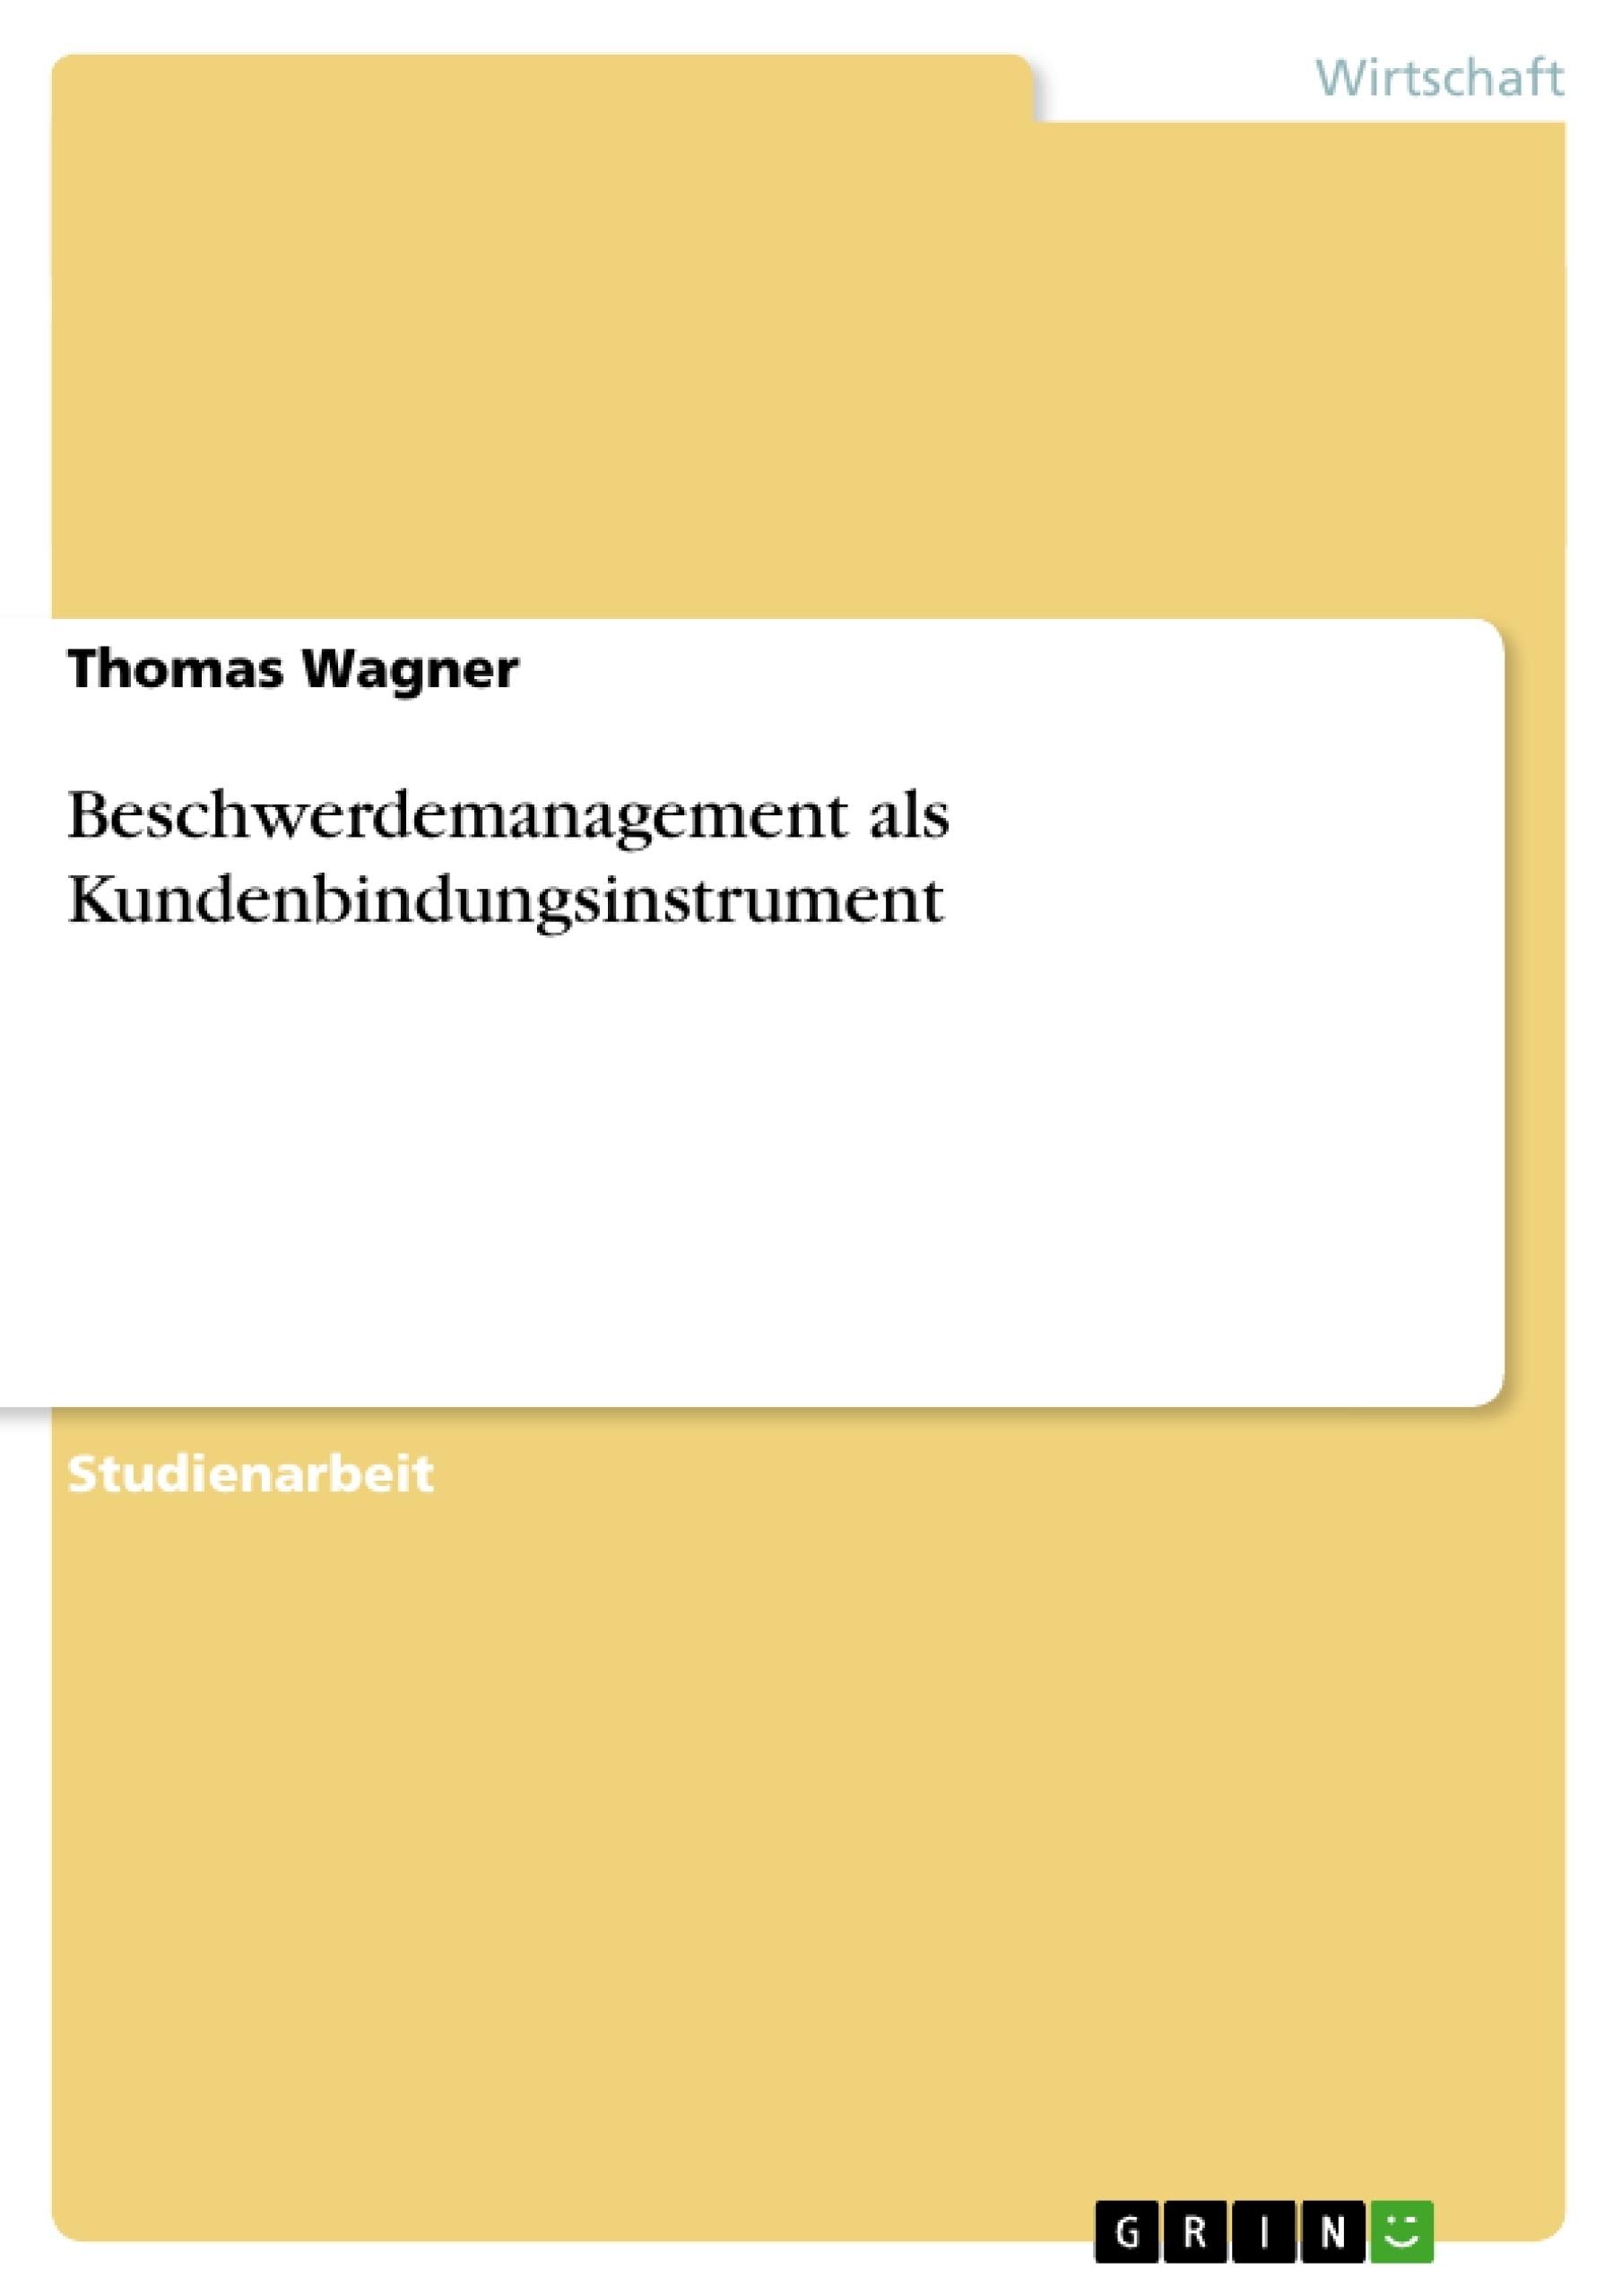 Titel: Beschwerdemanagement als Kundenbindungsinstrument